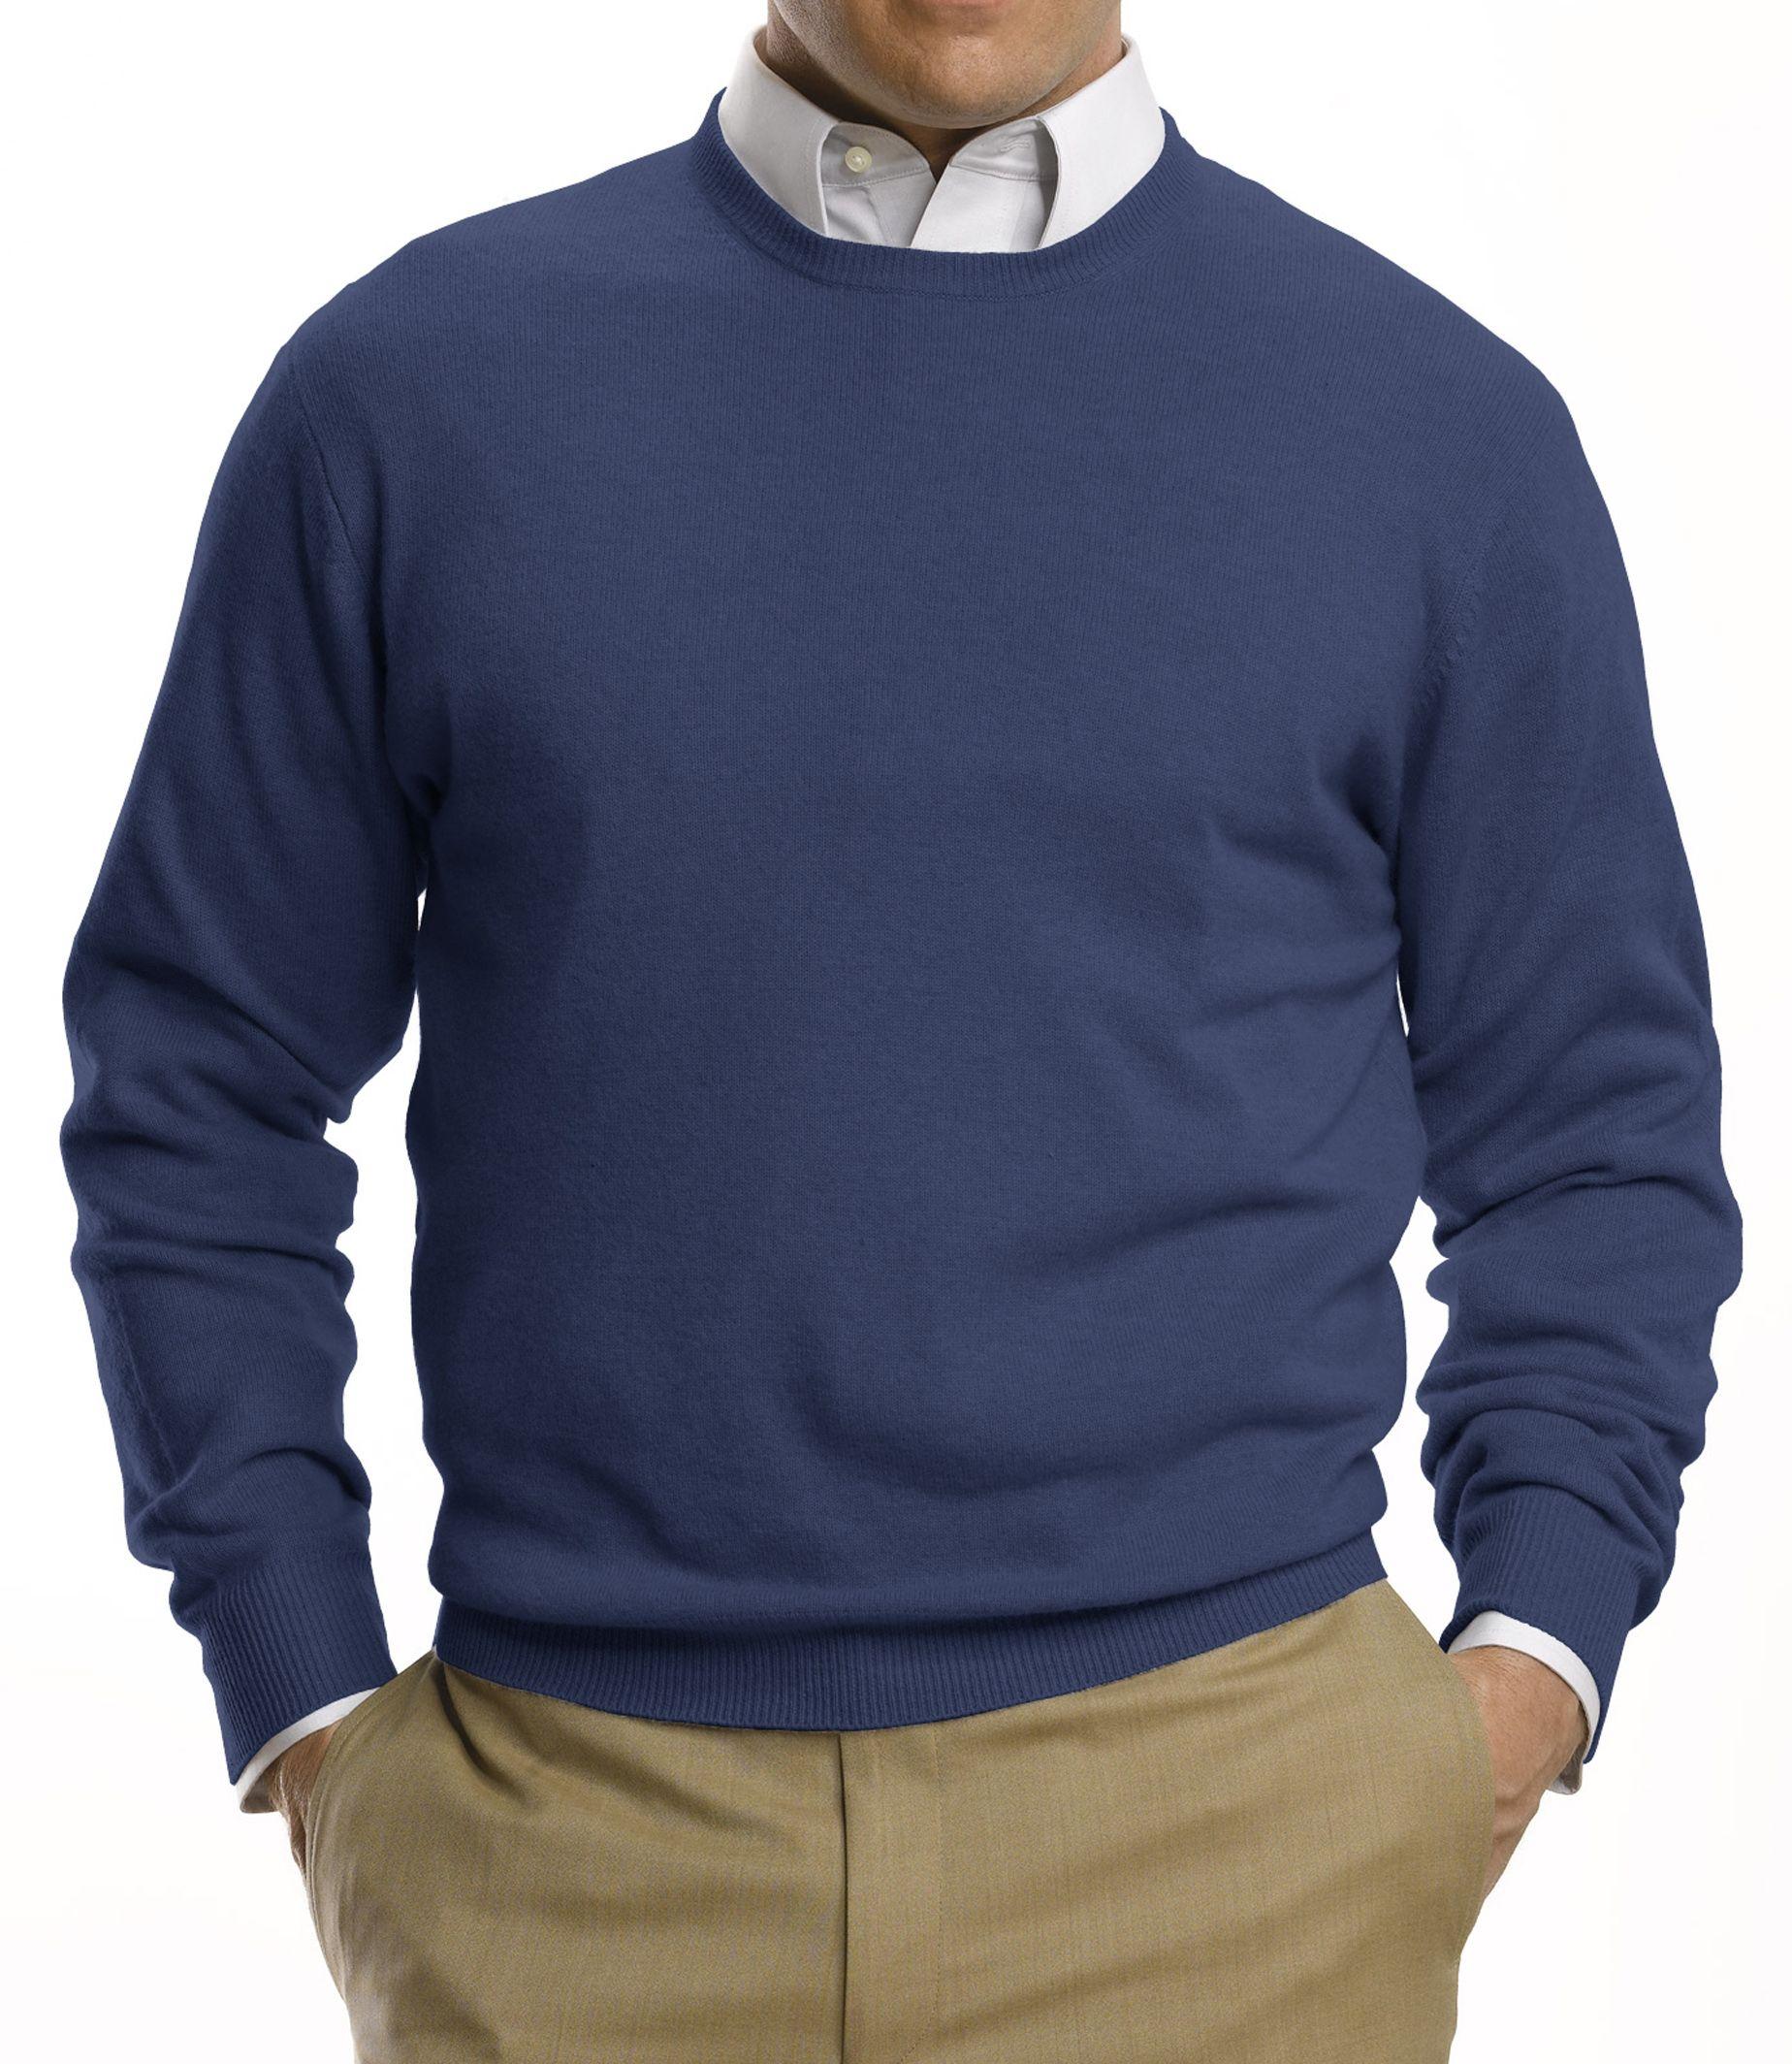 Traveler Cashmere Crew Neck Sweater